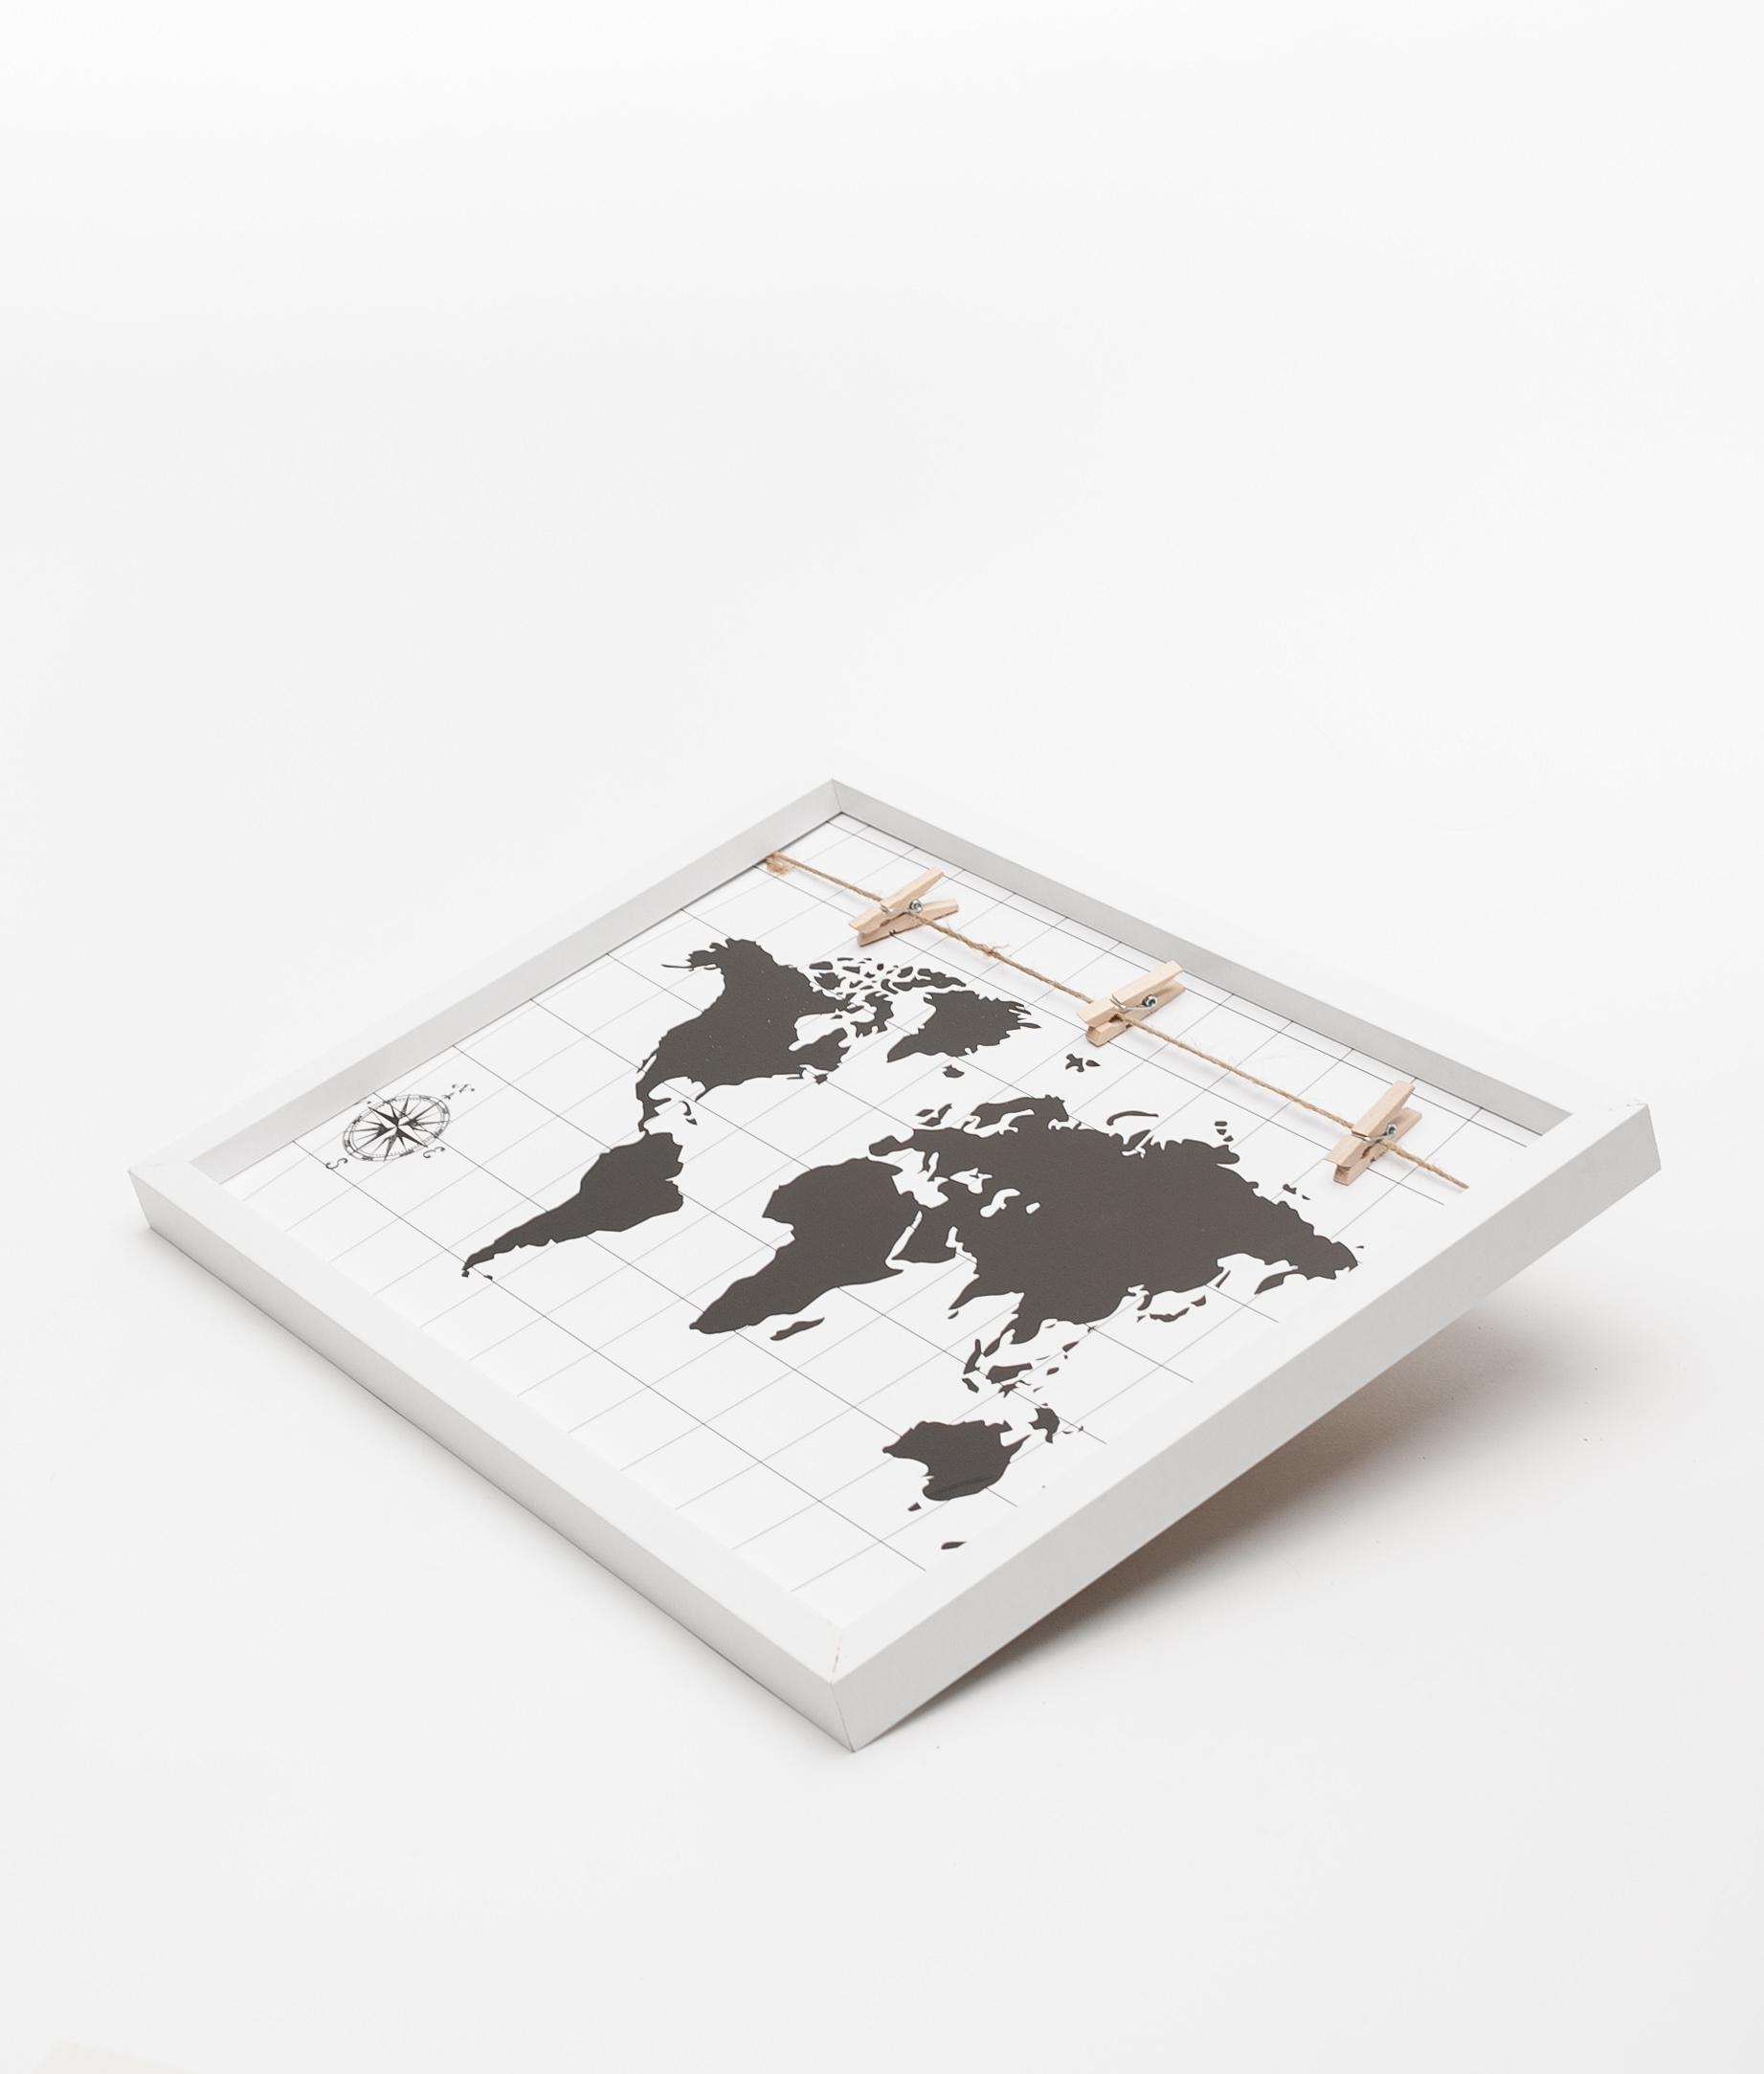 PORTAFOTOS WORLD - BLANCO